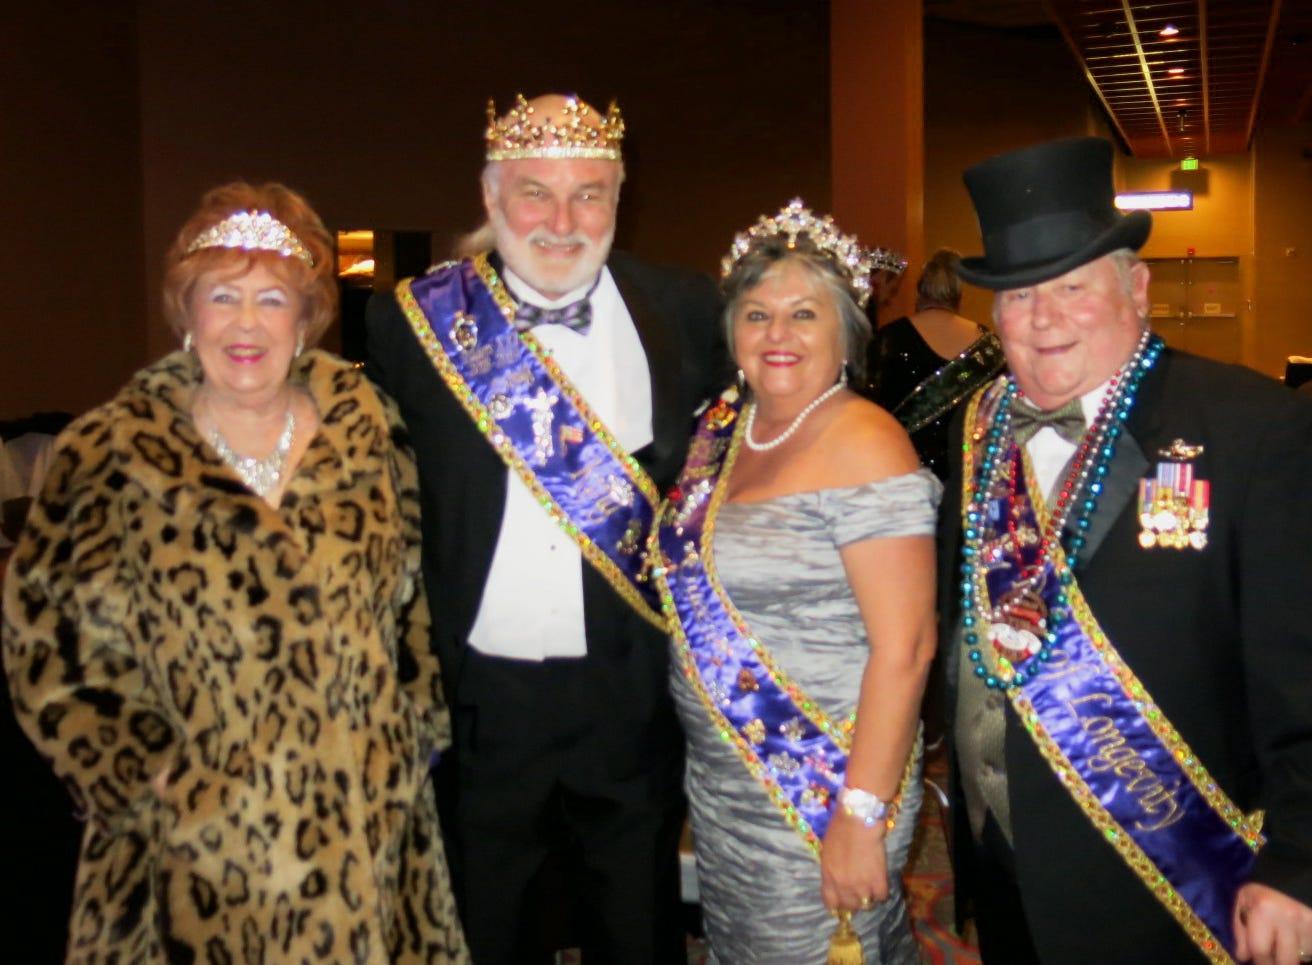 Krewe Artemis-Springhill Grand Bal was Saturday at Harrah's Louisiana Downs Red River Room.